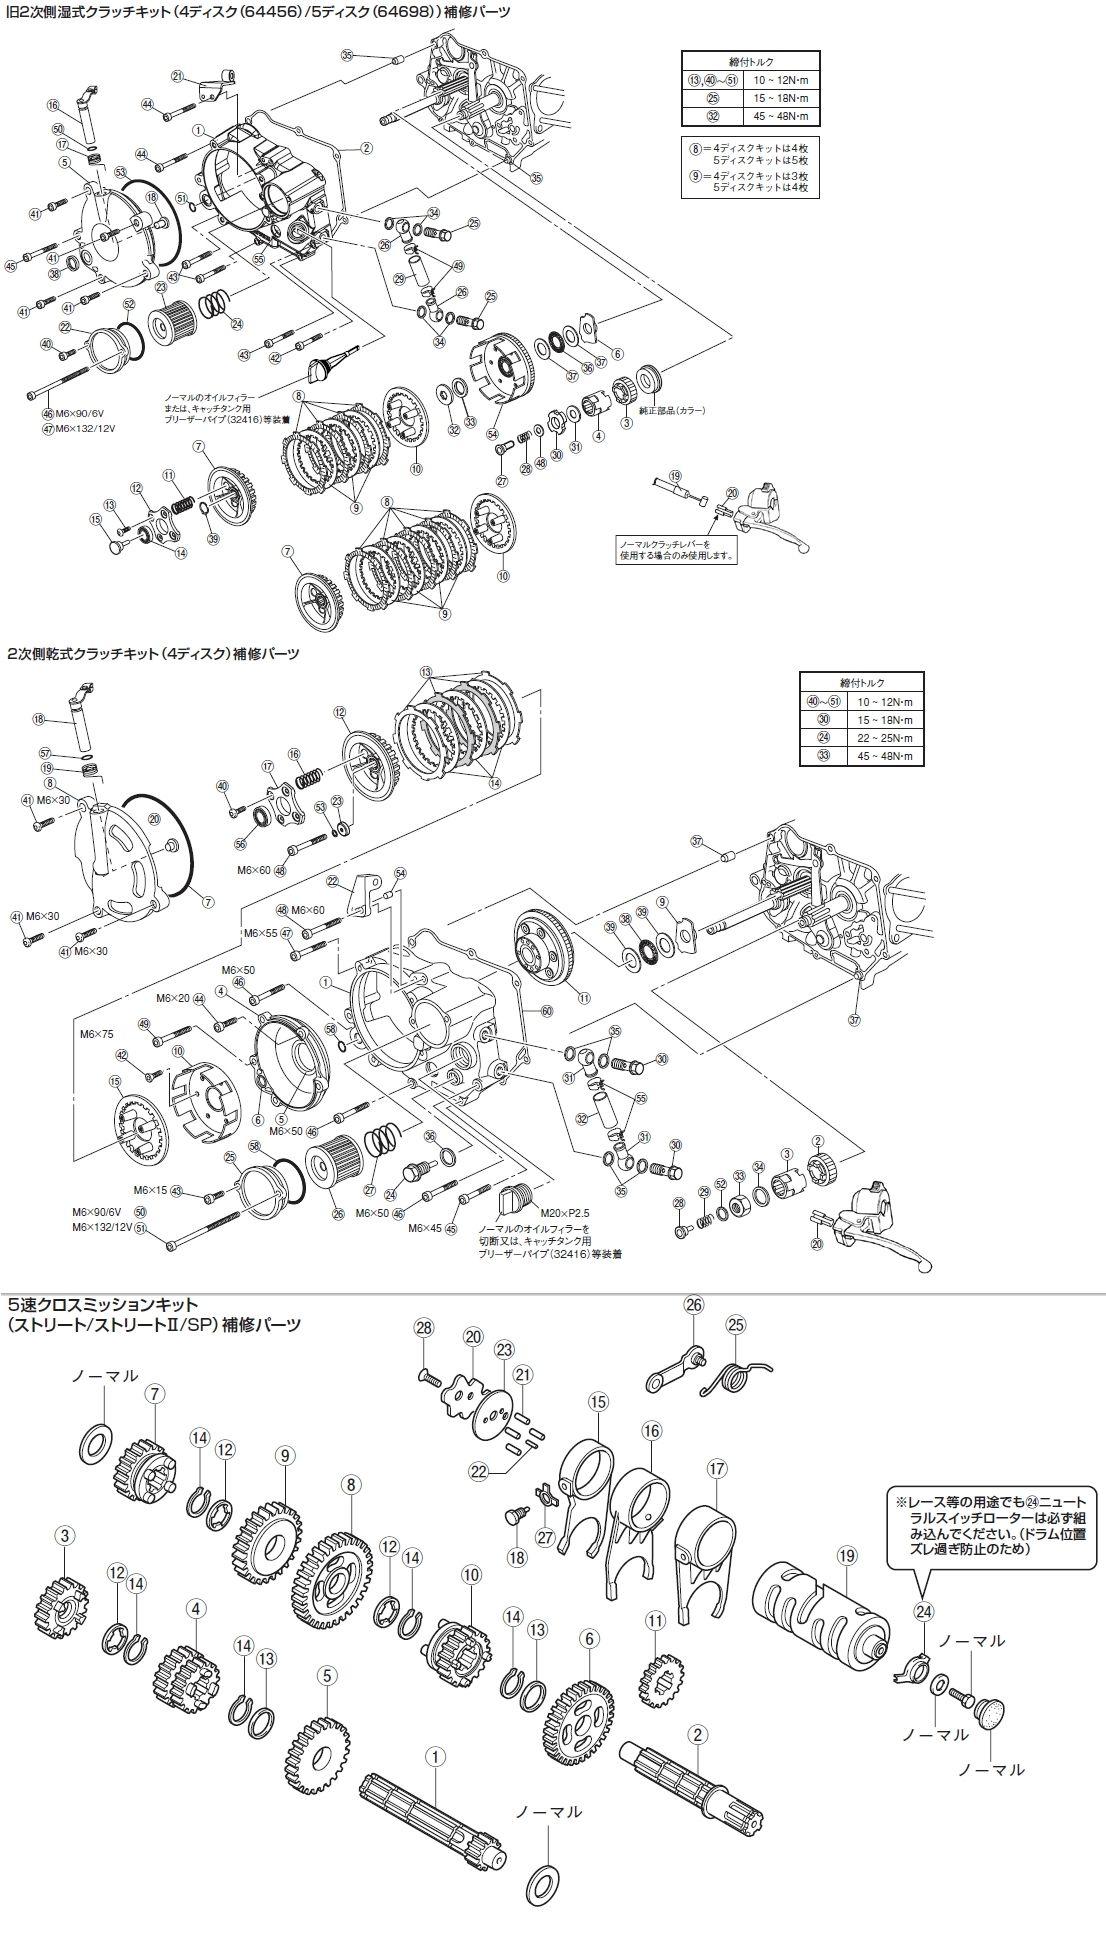 【DAYTONA】【離合器套件共有維修零件】壓板 - 「Webike-摩托百貨」